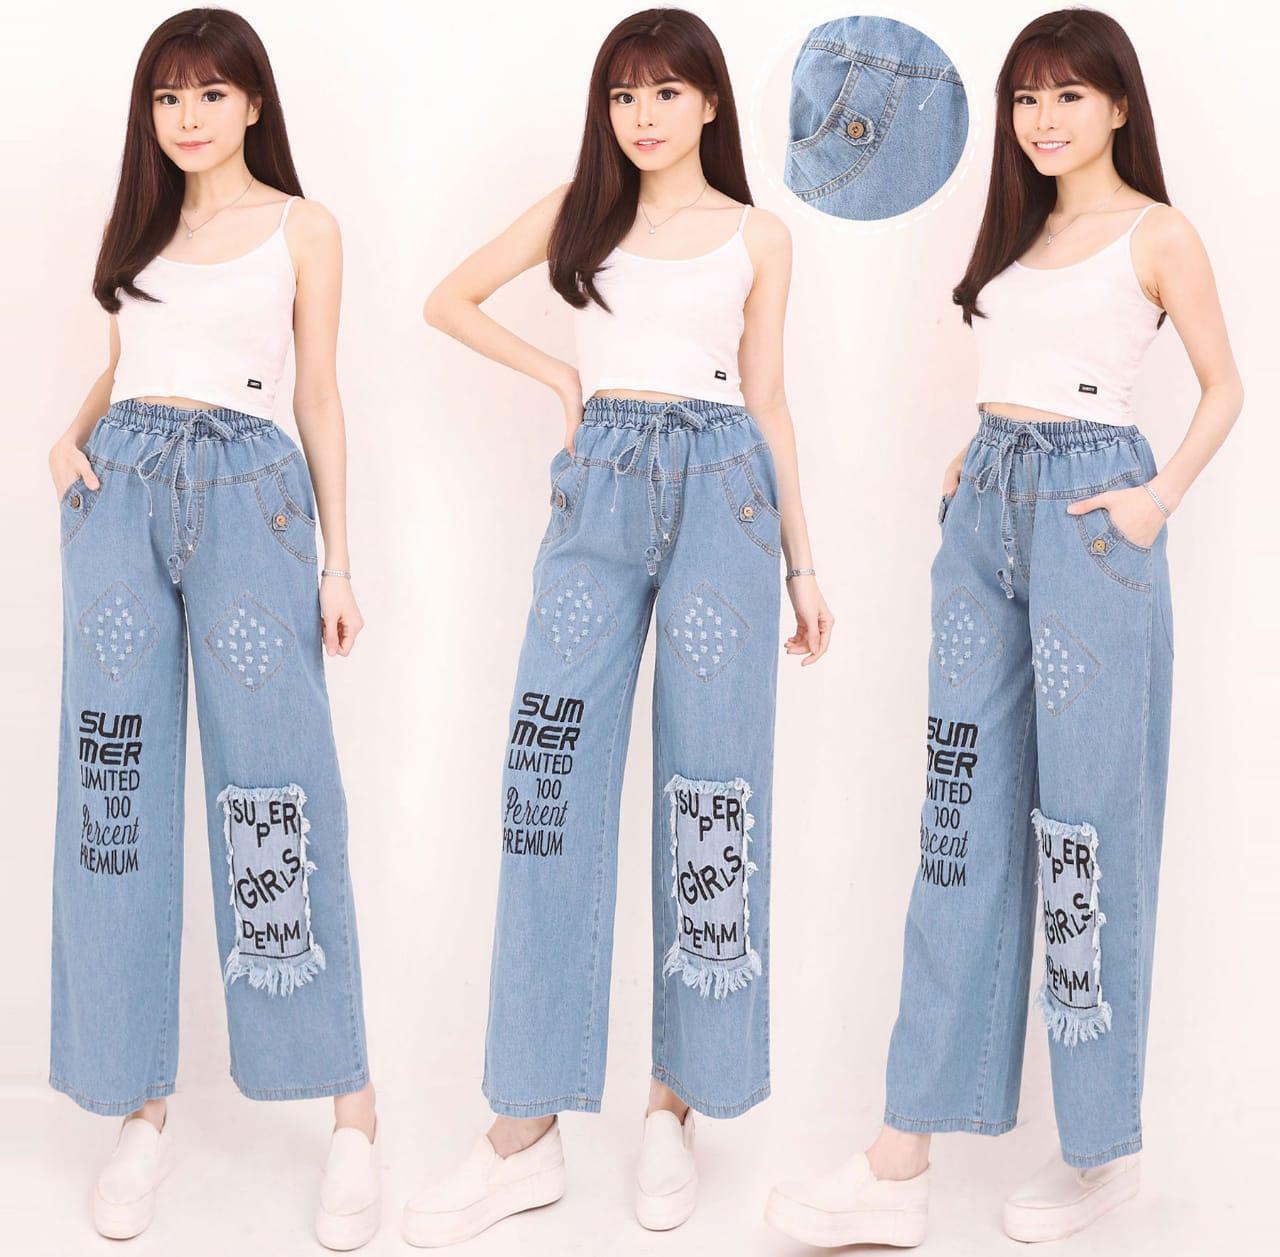 Miracle Celana Panjang Agnan Longpants Kulot Casual Jeans Wanita All Size Biru Muda